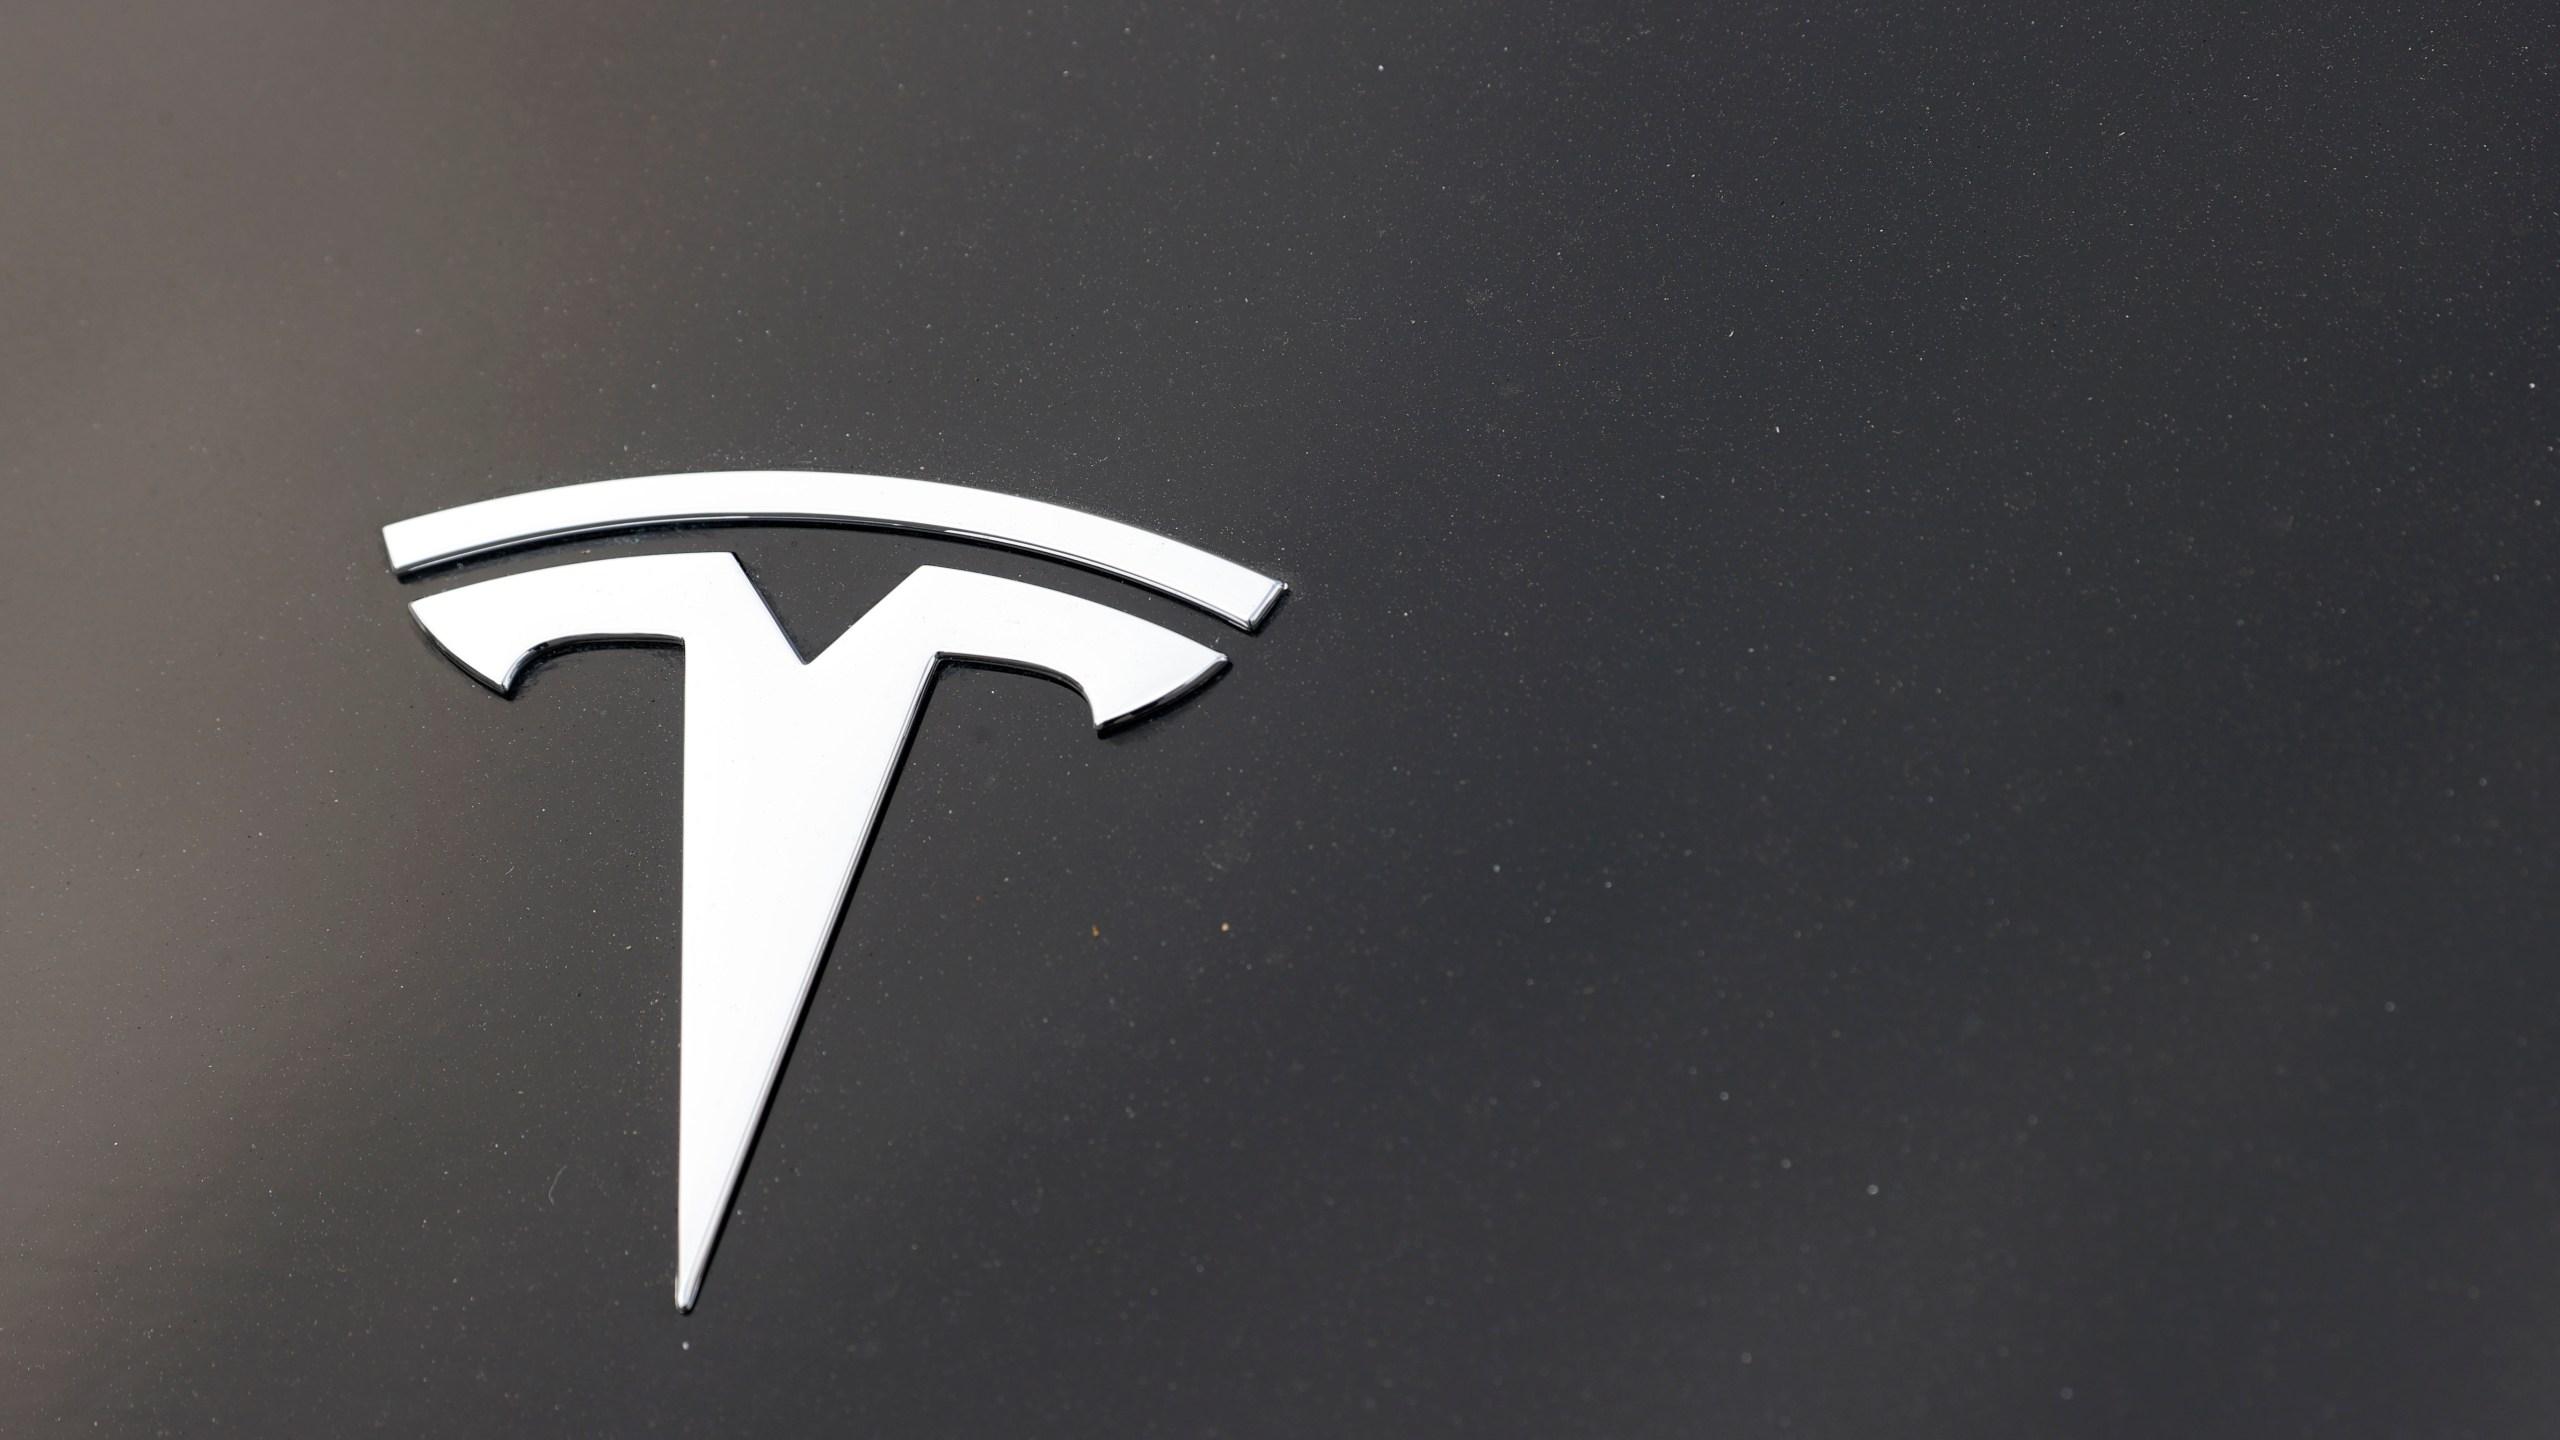 2020 Tesla Model Y, r m